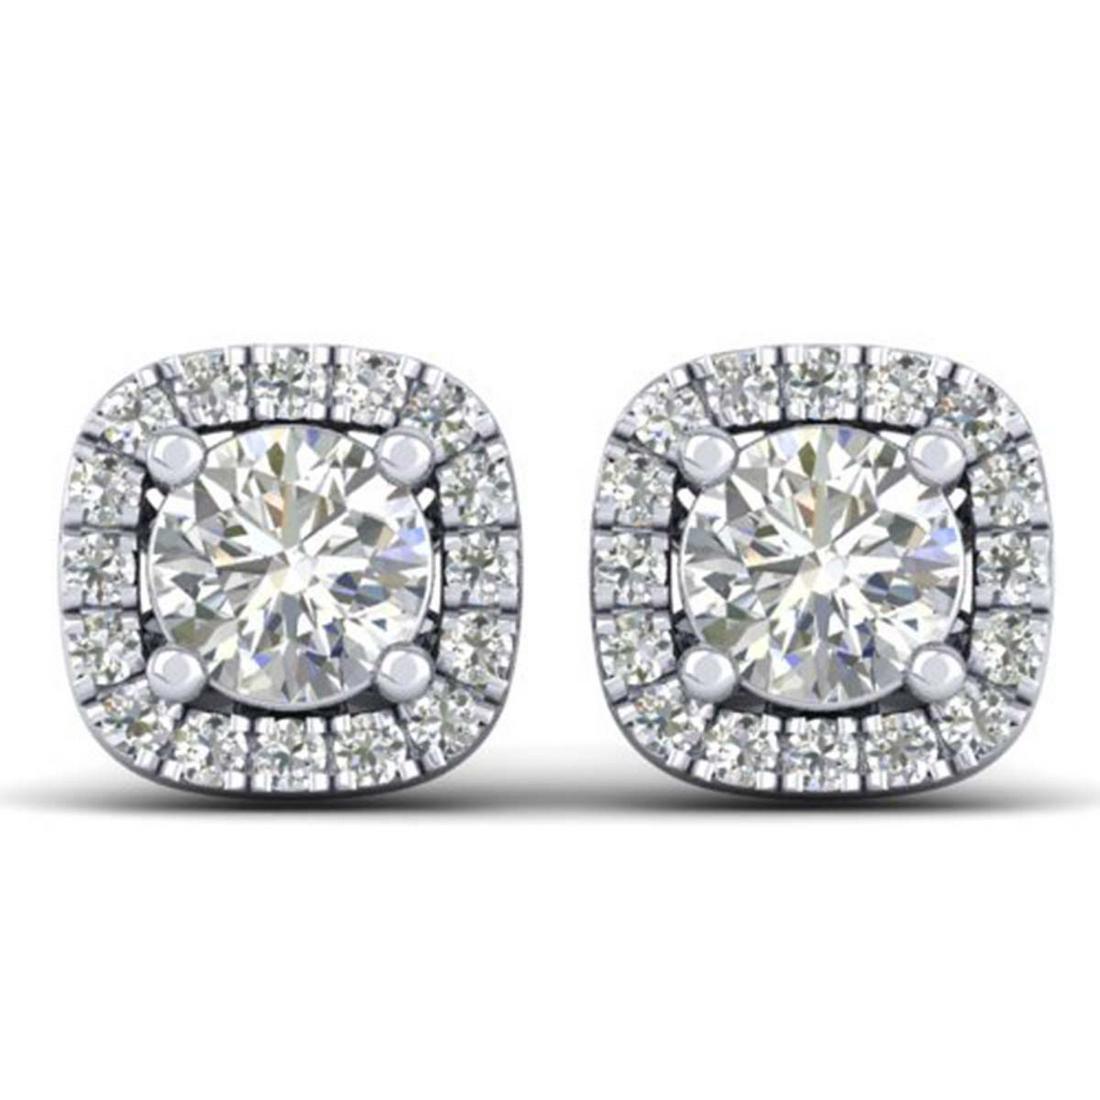 1.08 ctw VS/SI Diamond Stud Halo Earrings 14K White